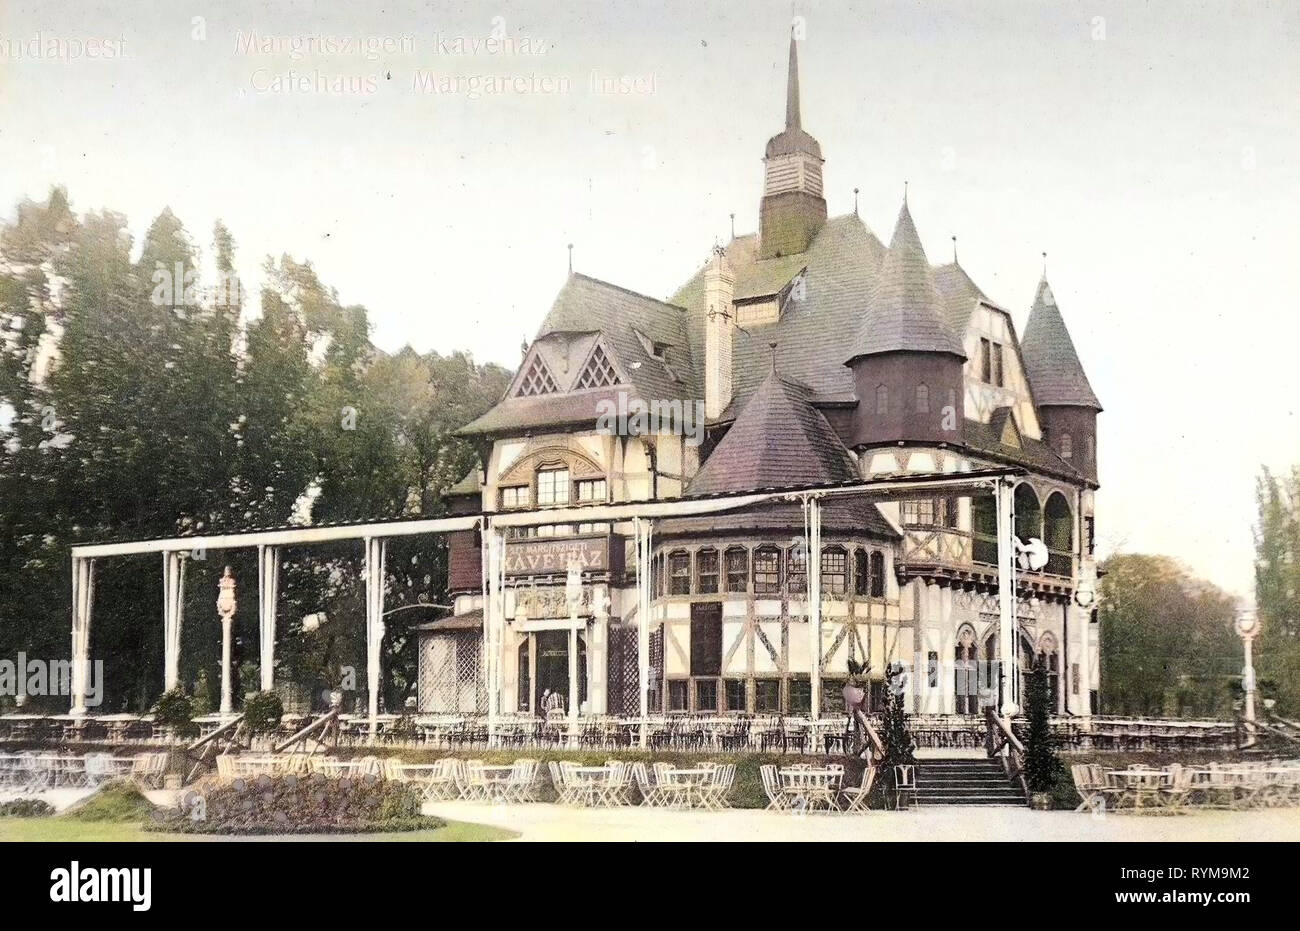 Cafés in Budapest, Margaret Island, 1905, Budapest, Cafehaus Margareteninsel, Hungary Stock Photo